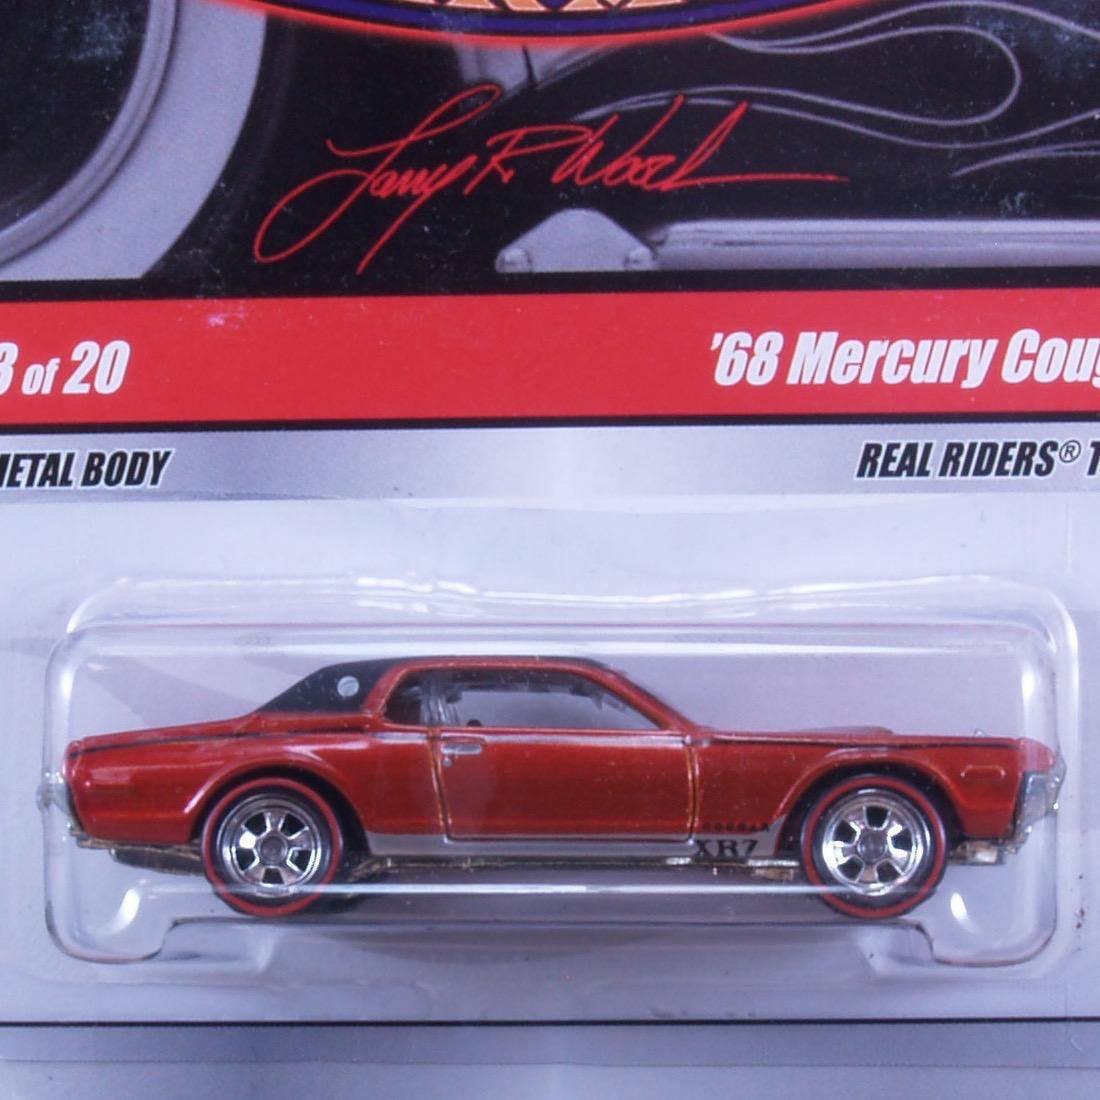 Larry's Garage : '68 Mercury Cougar (RED)